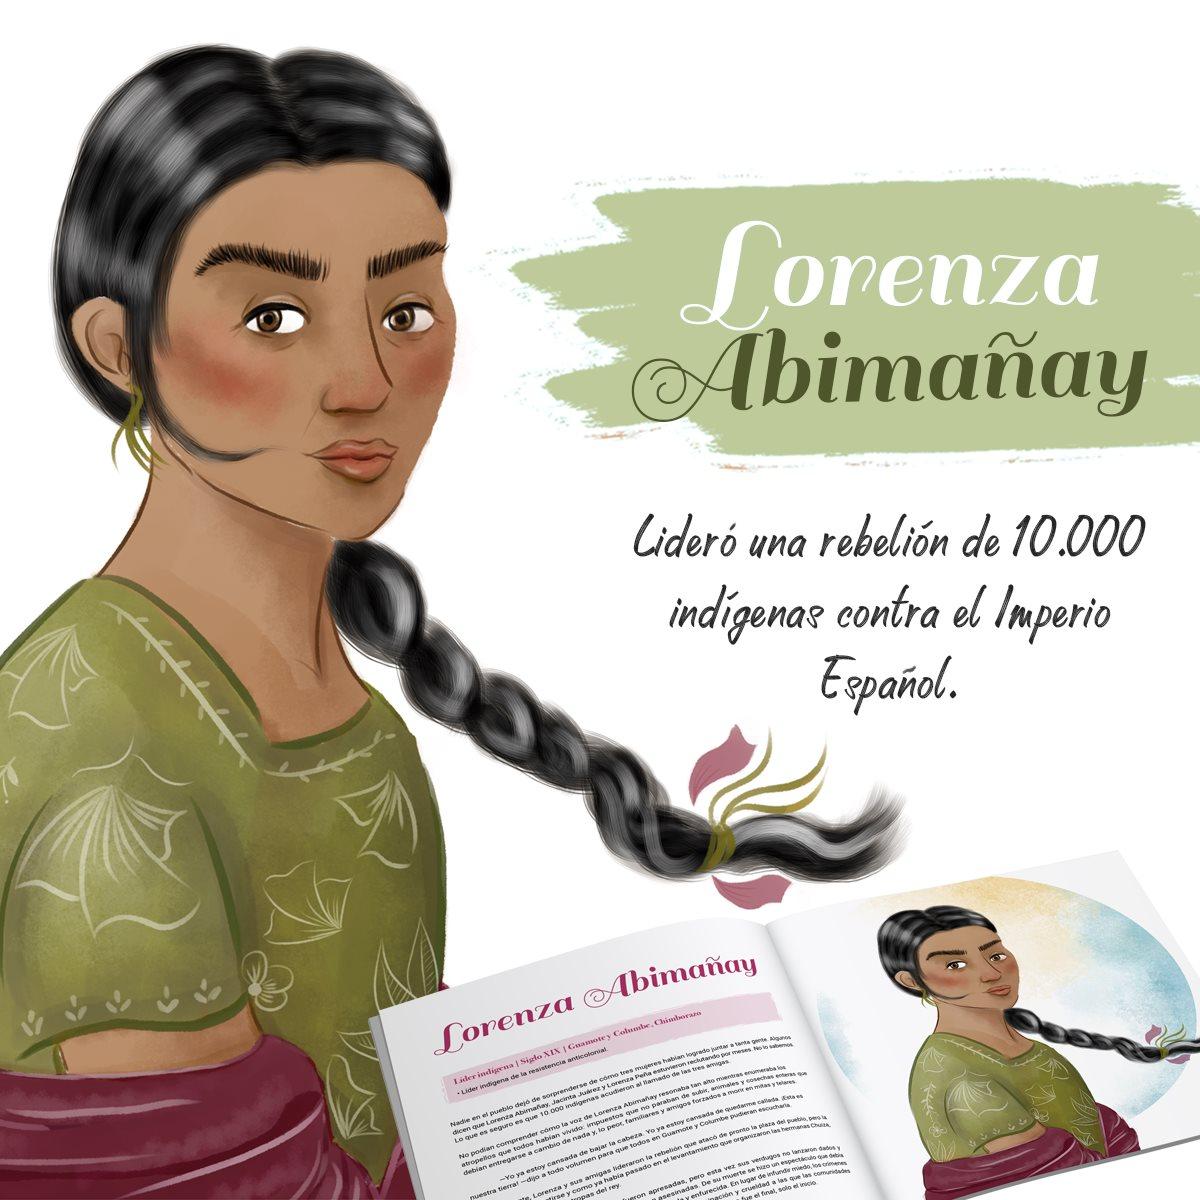 Lorenza Abimañay| ©KynkuMarketingSocial